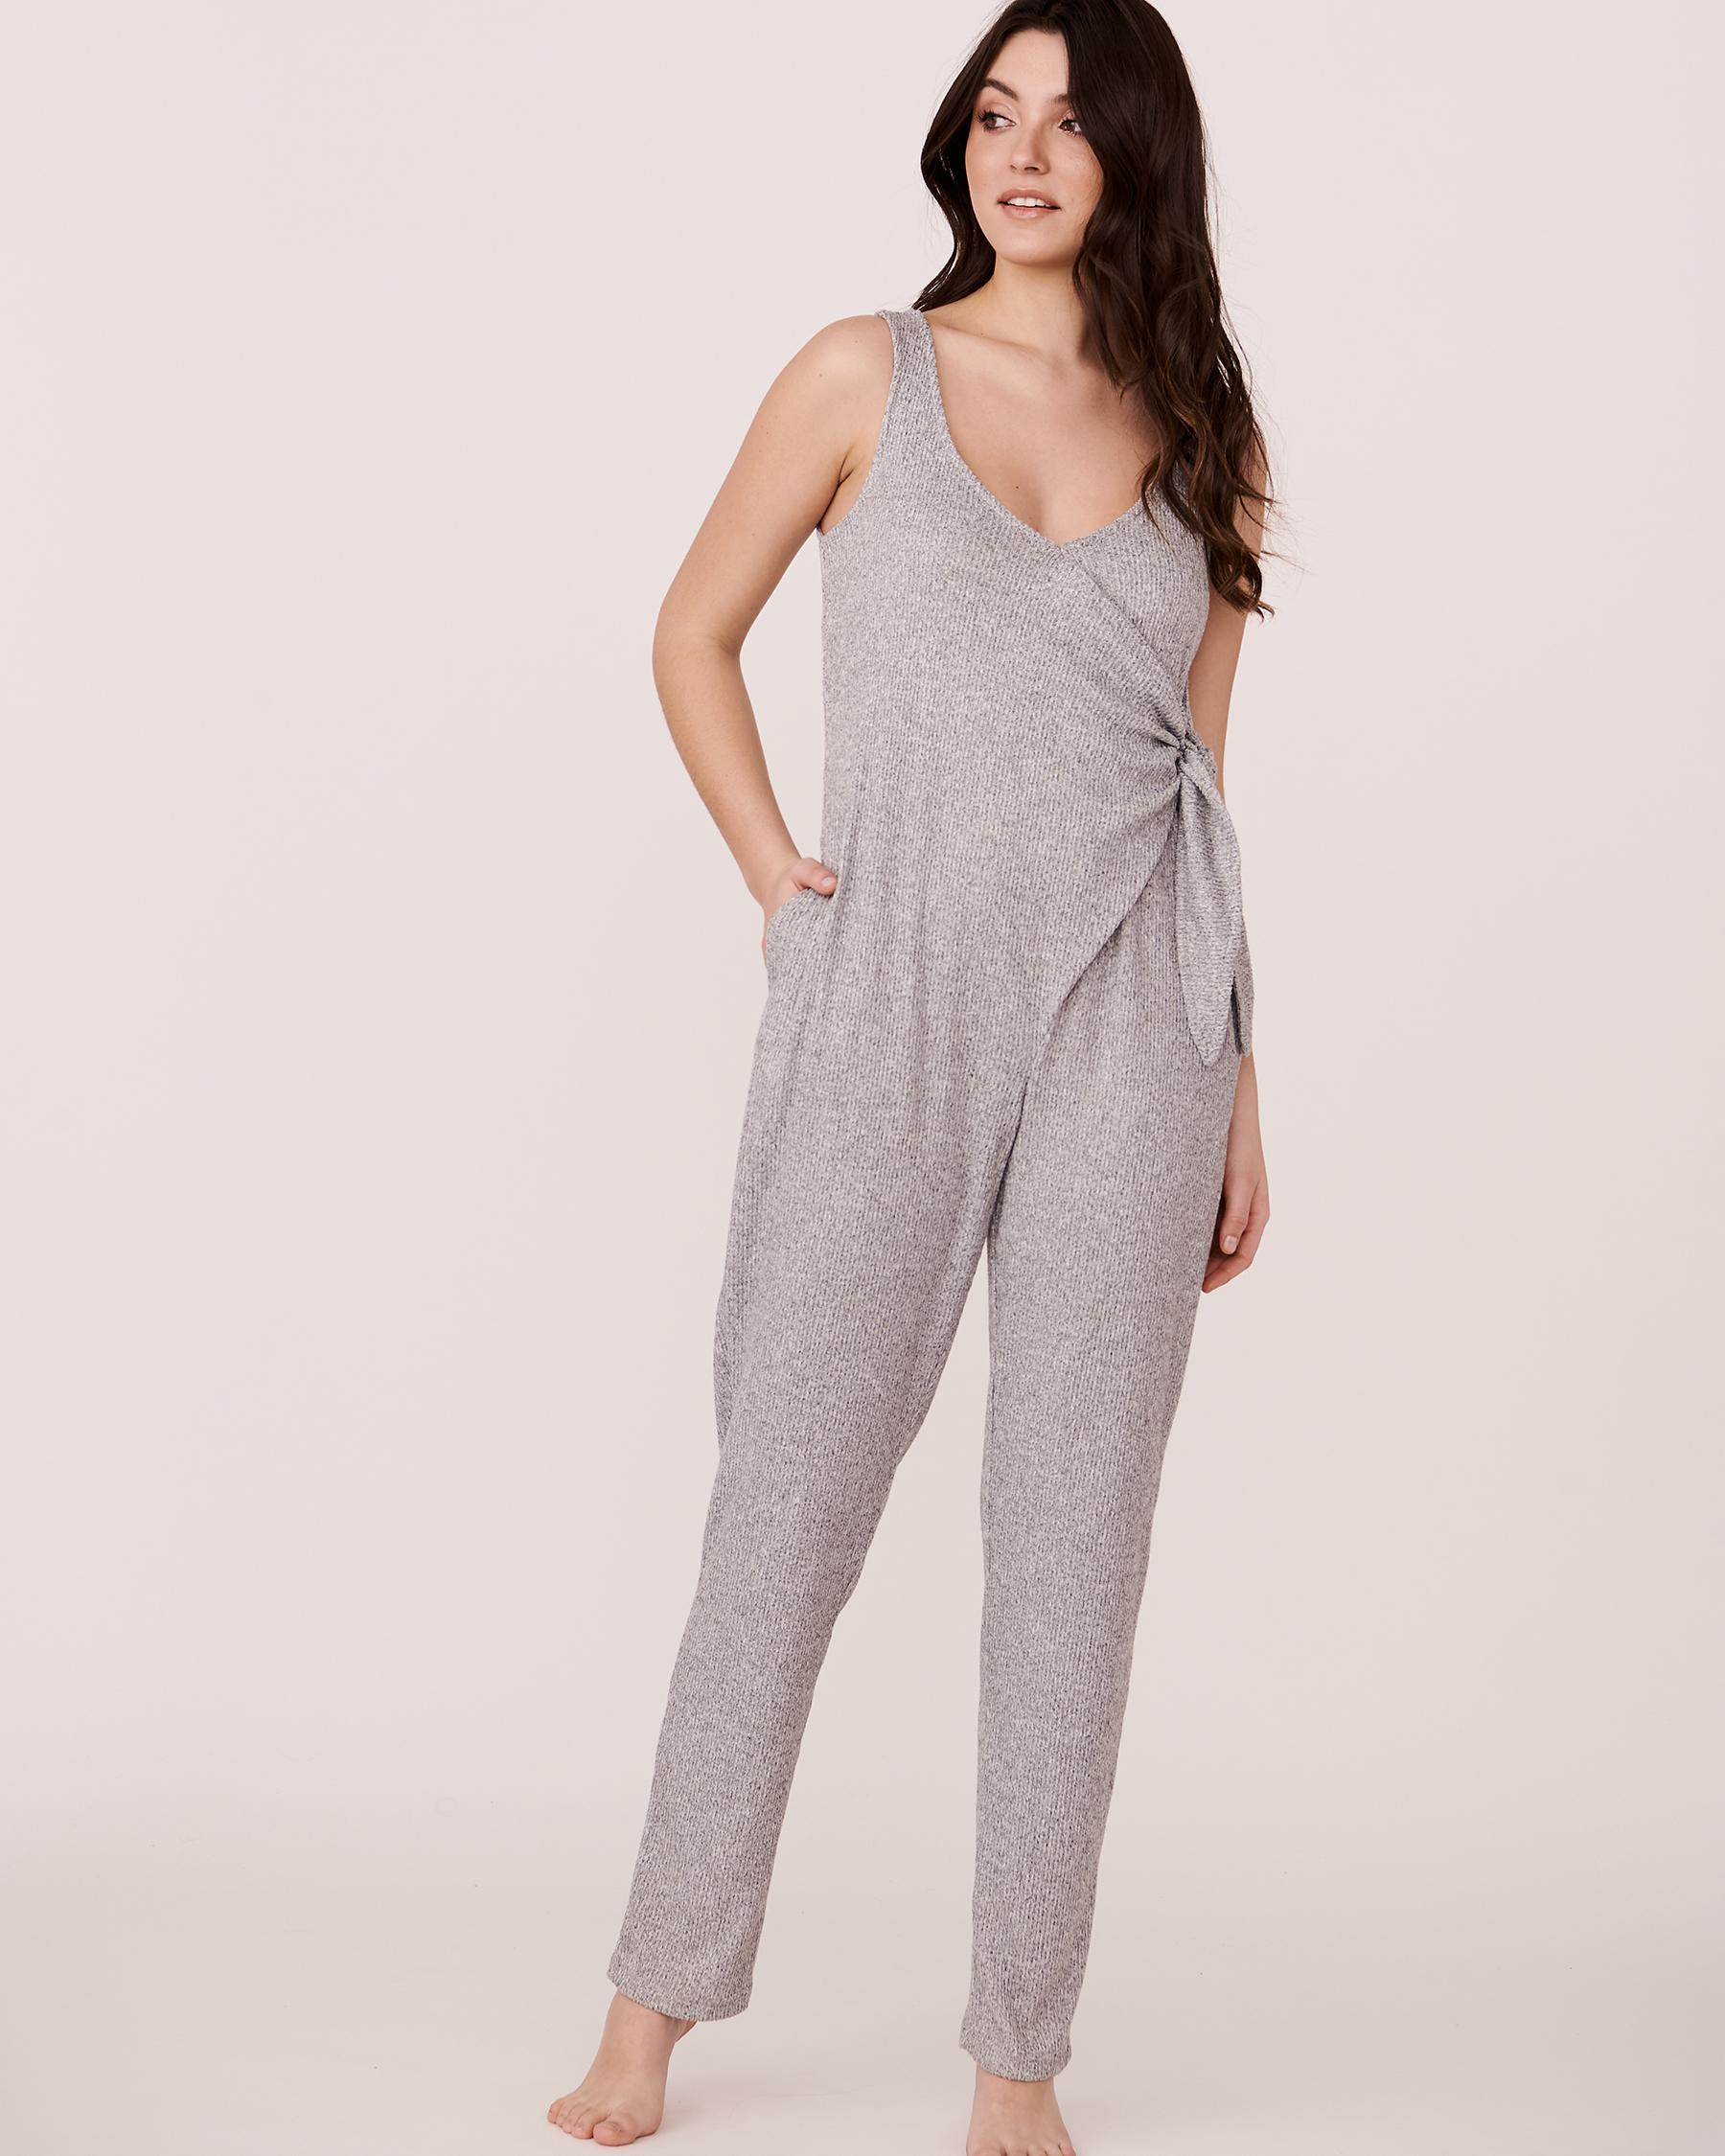 LA VIE EN ROSE Ribbed V-Neckline Jumpsuit Grey 774-474-2-04 - View1